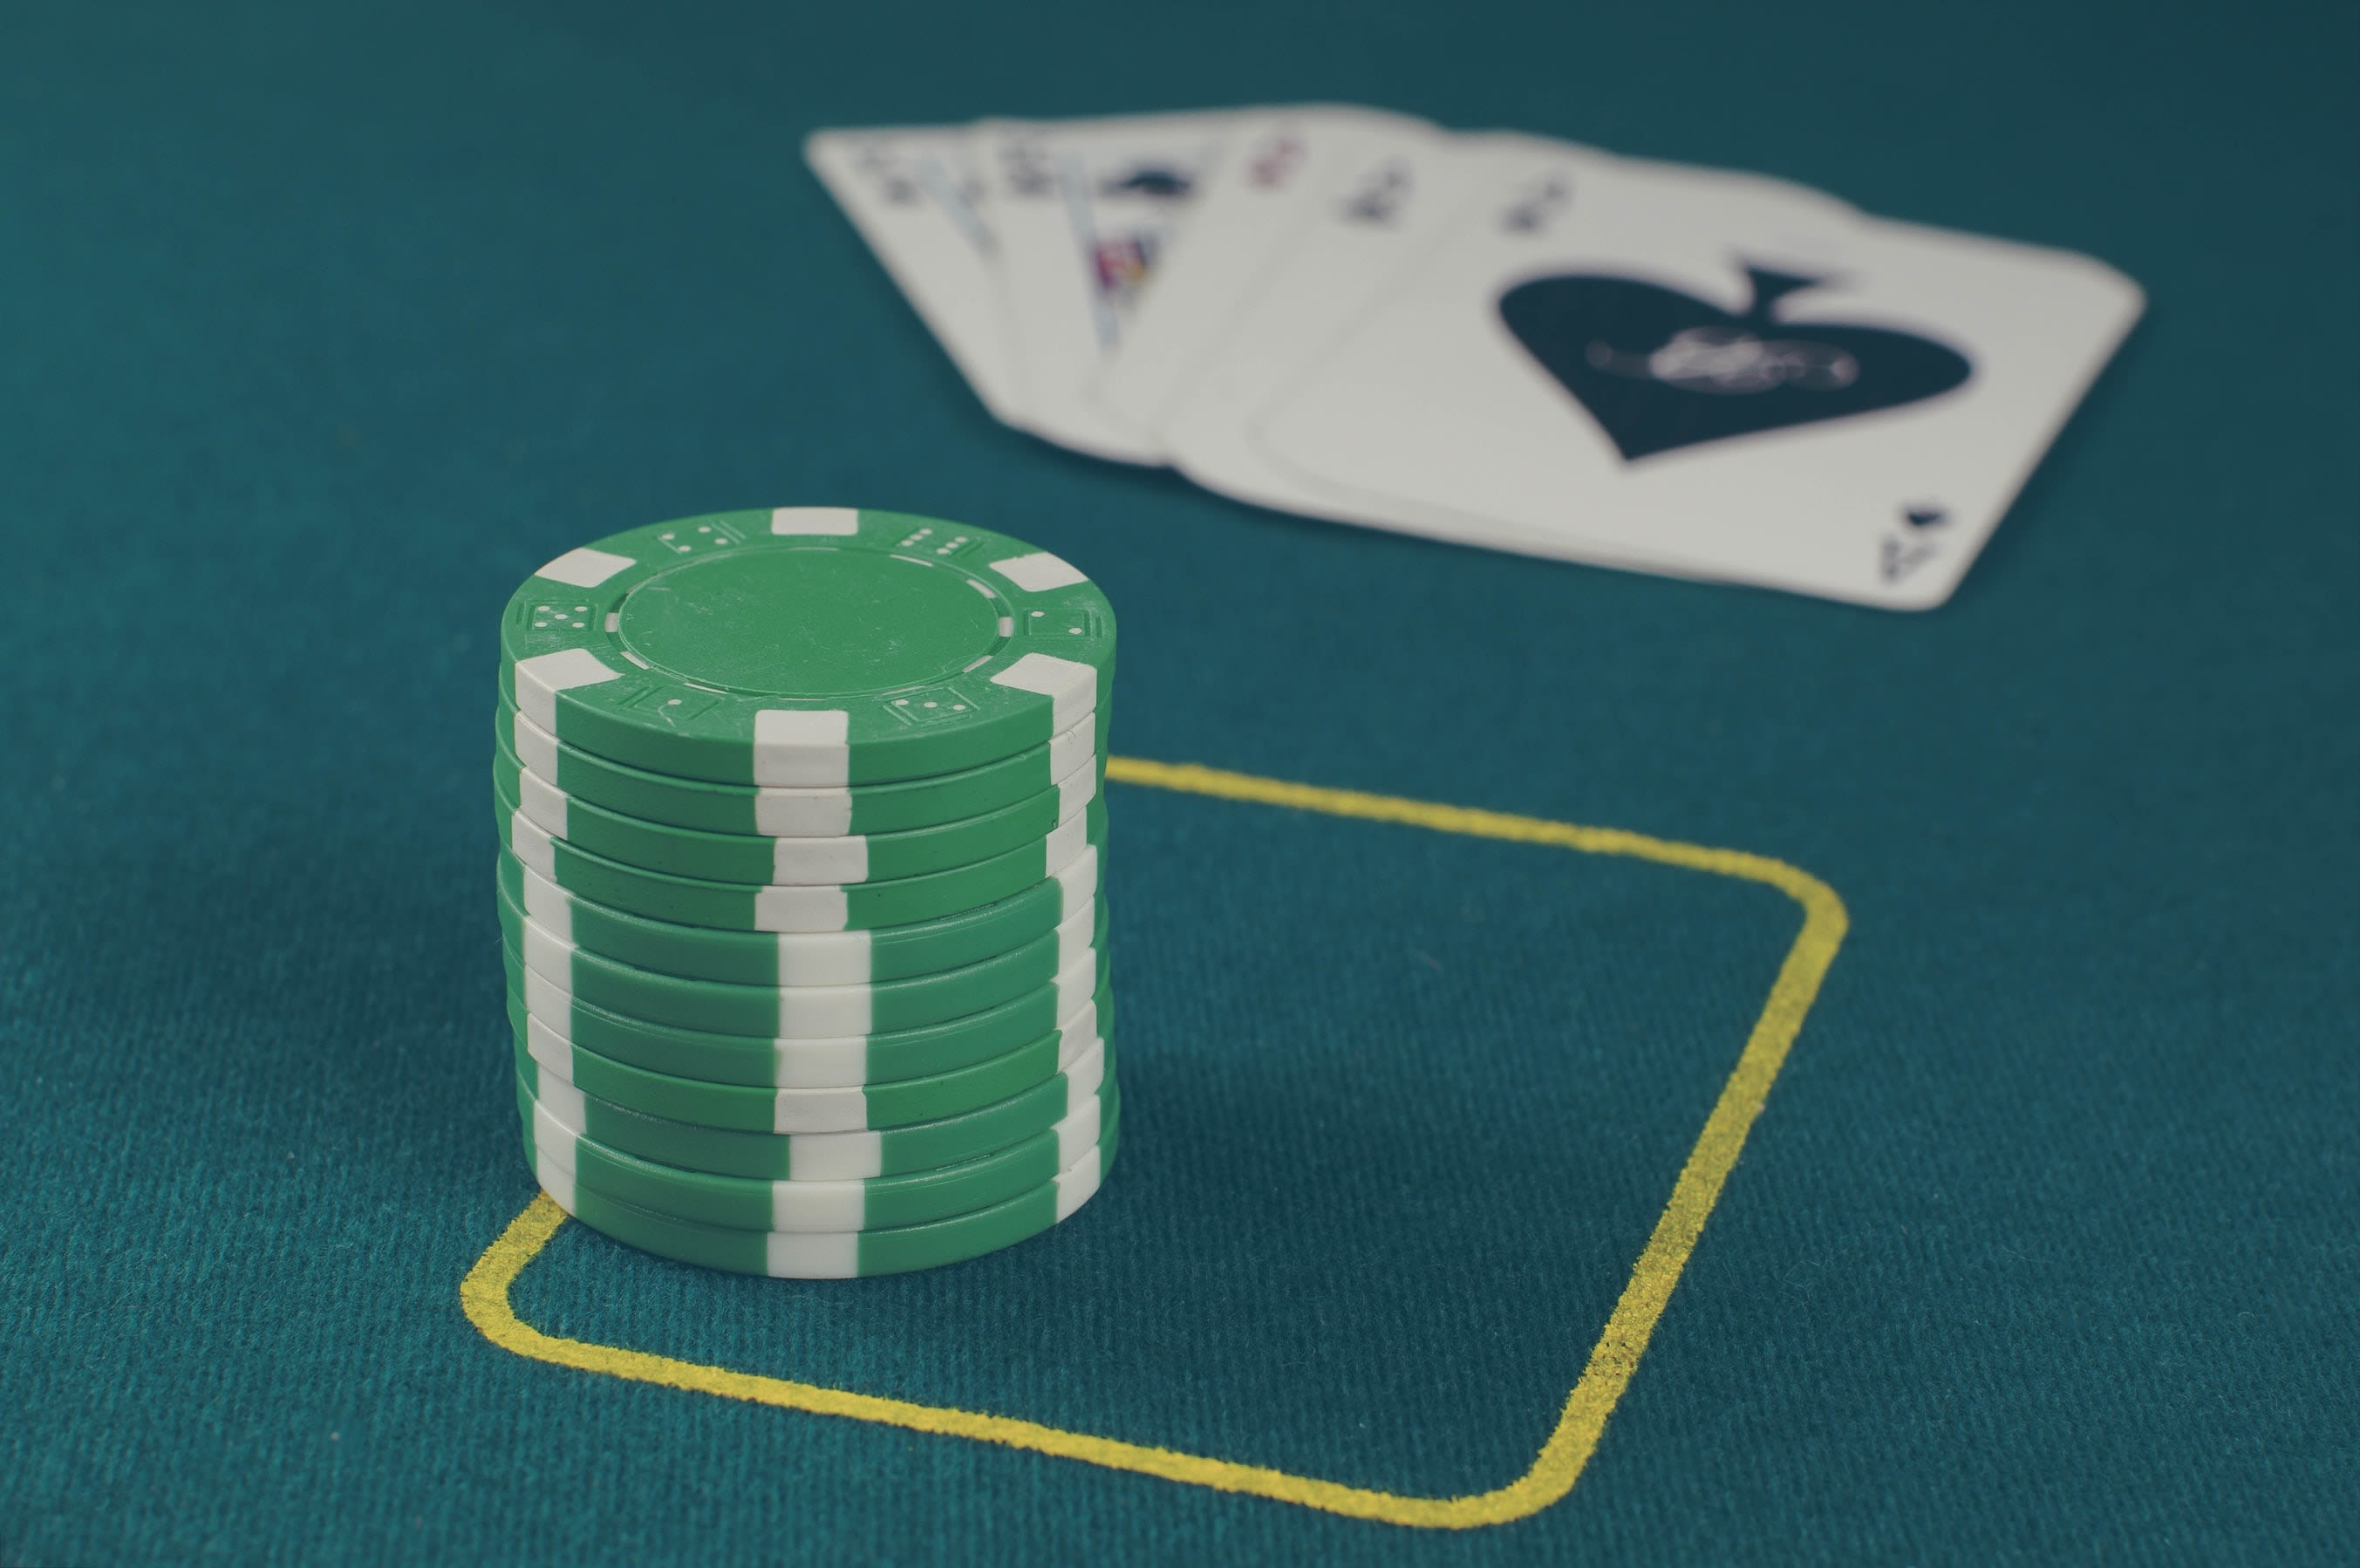 Texas Hold'em Online: Belajar Asasnya